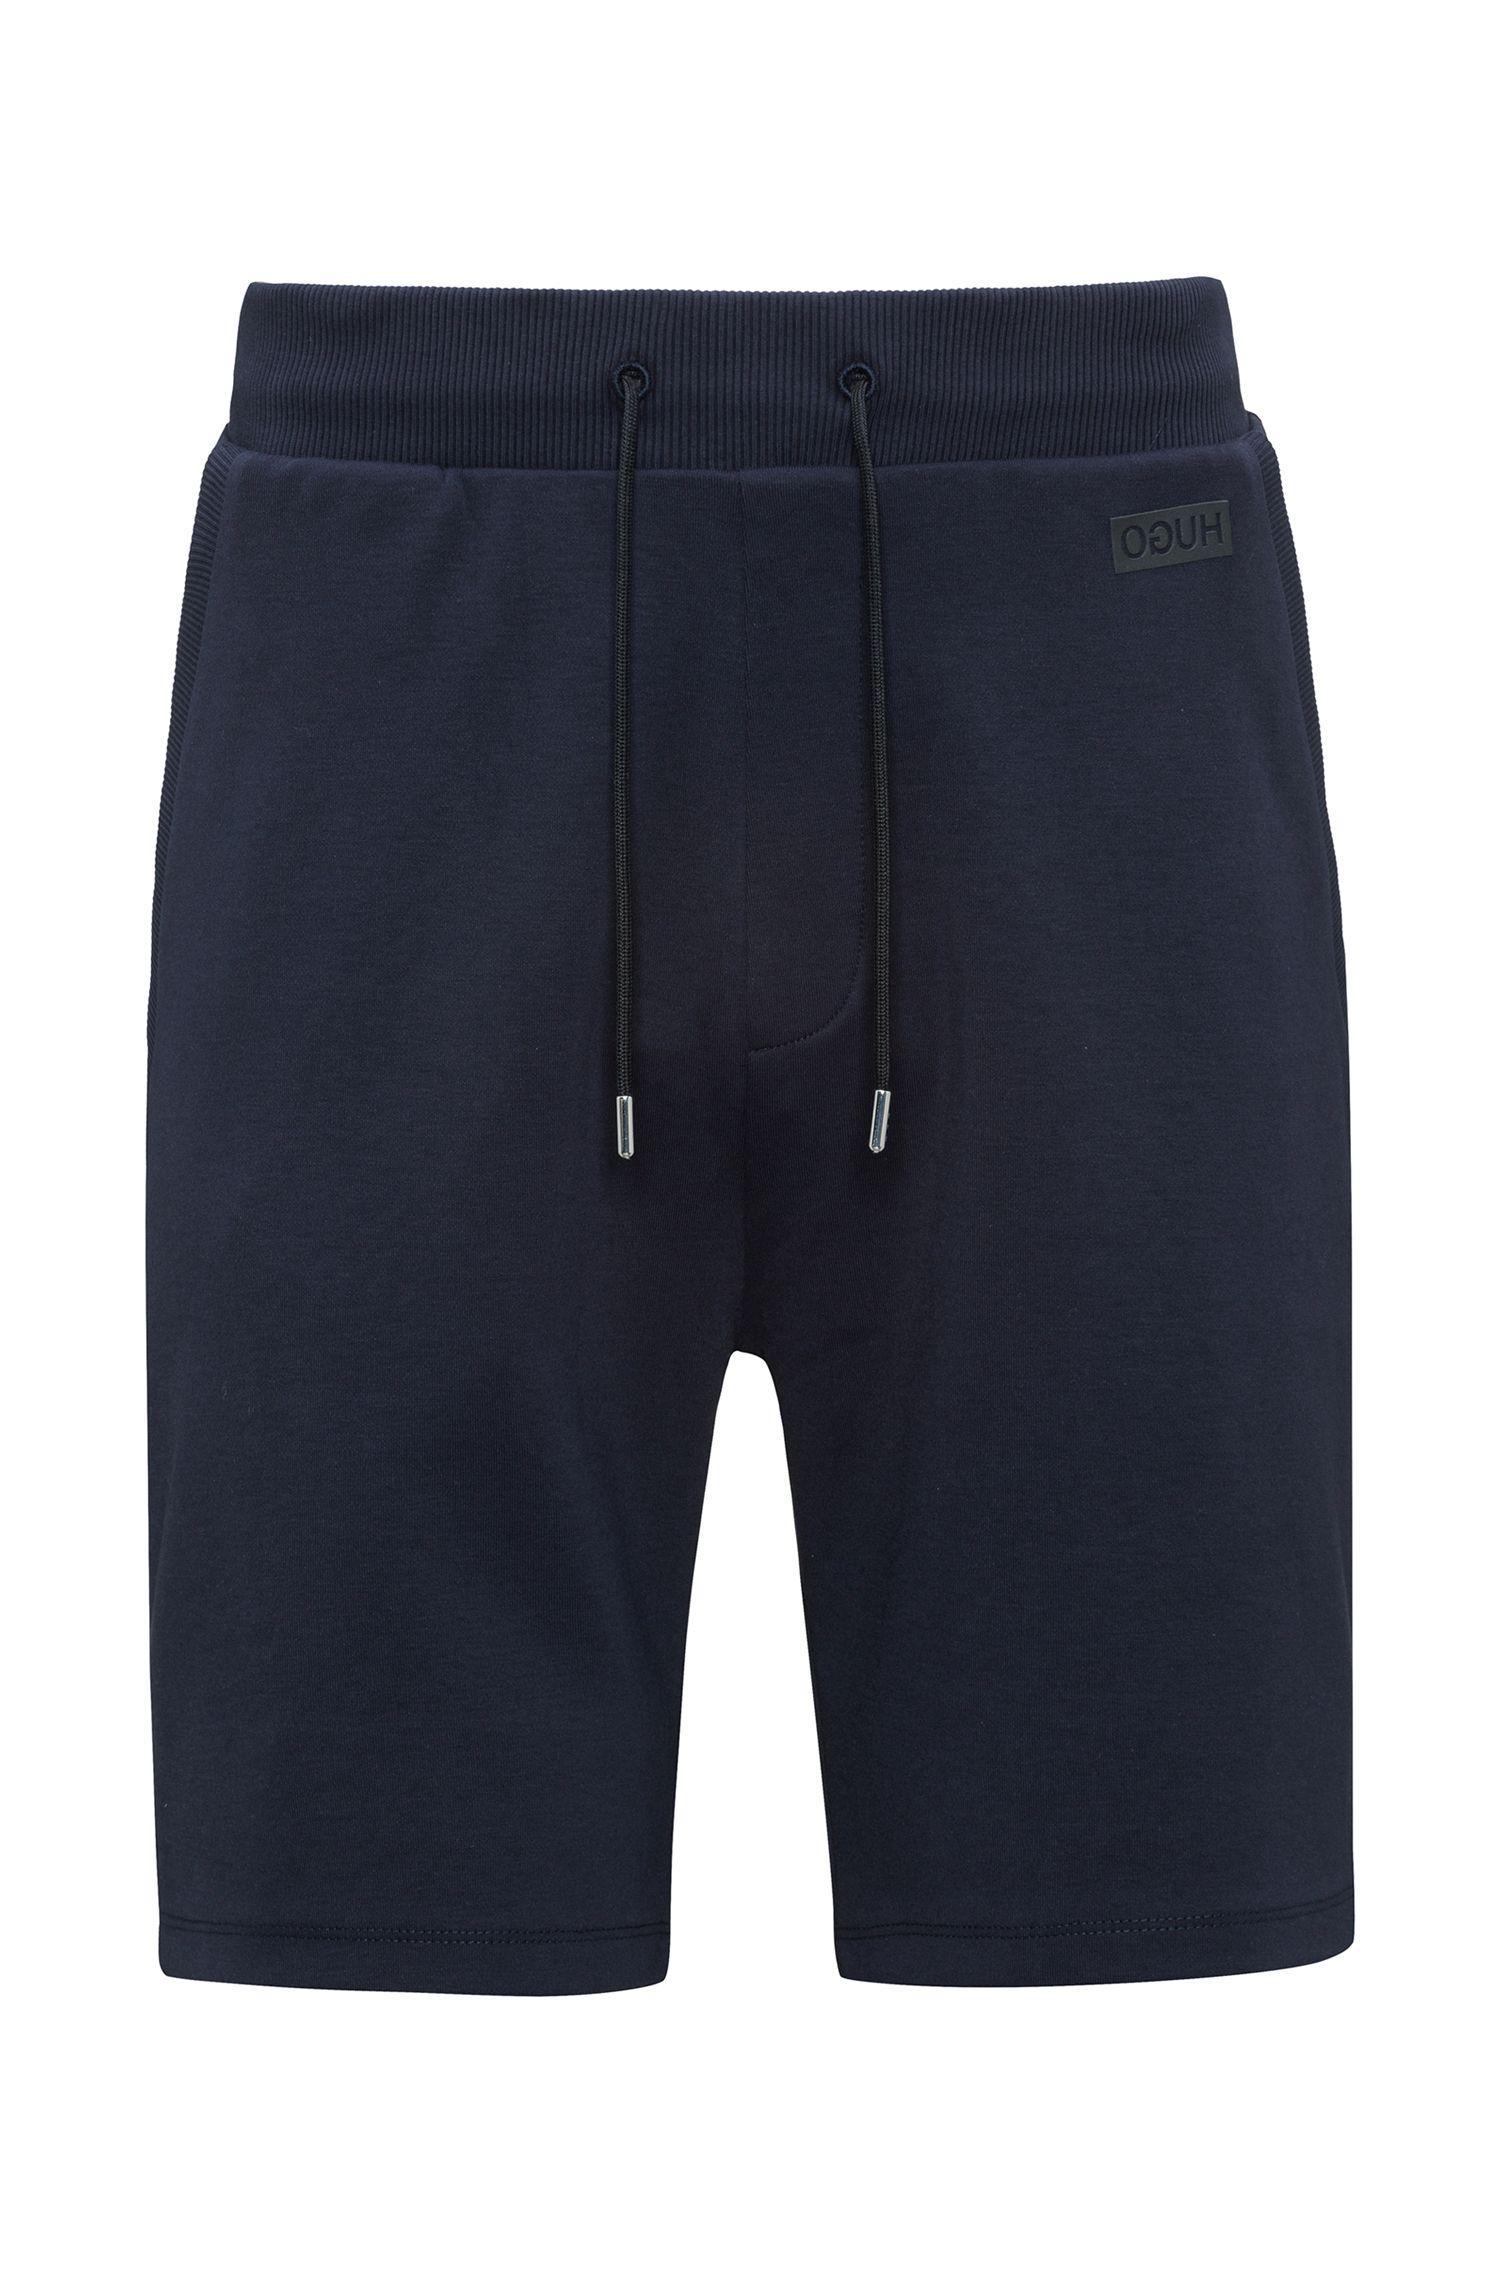 Short en coton interlock à cordon de serrage